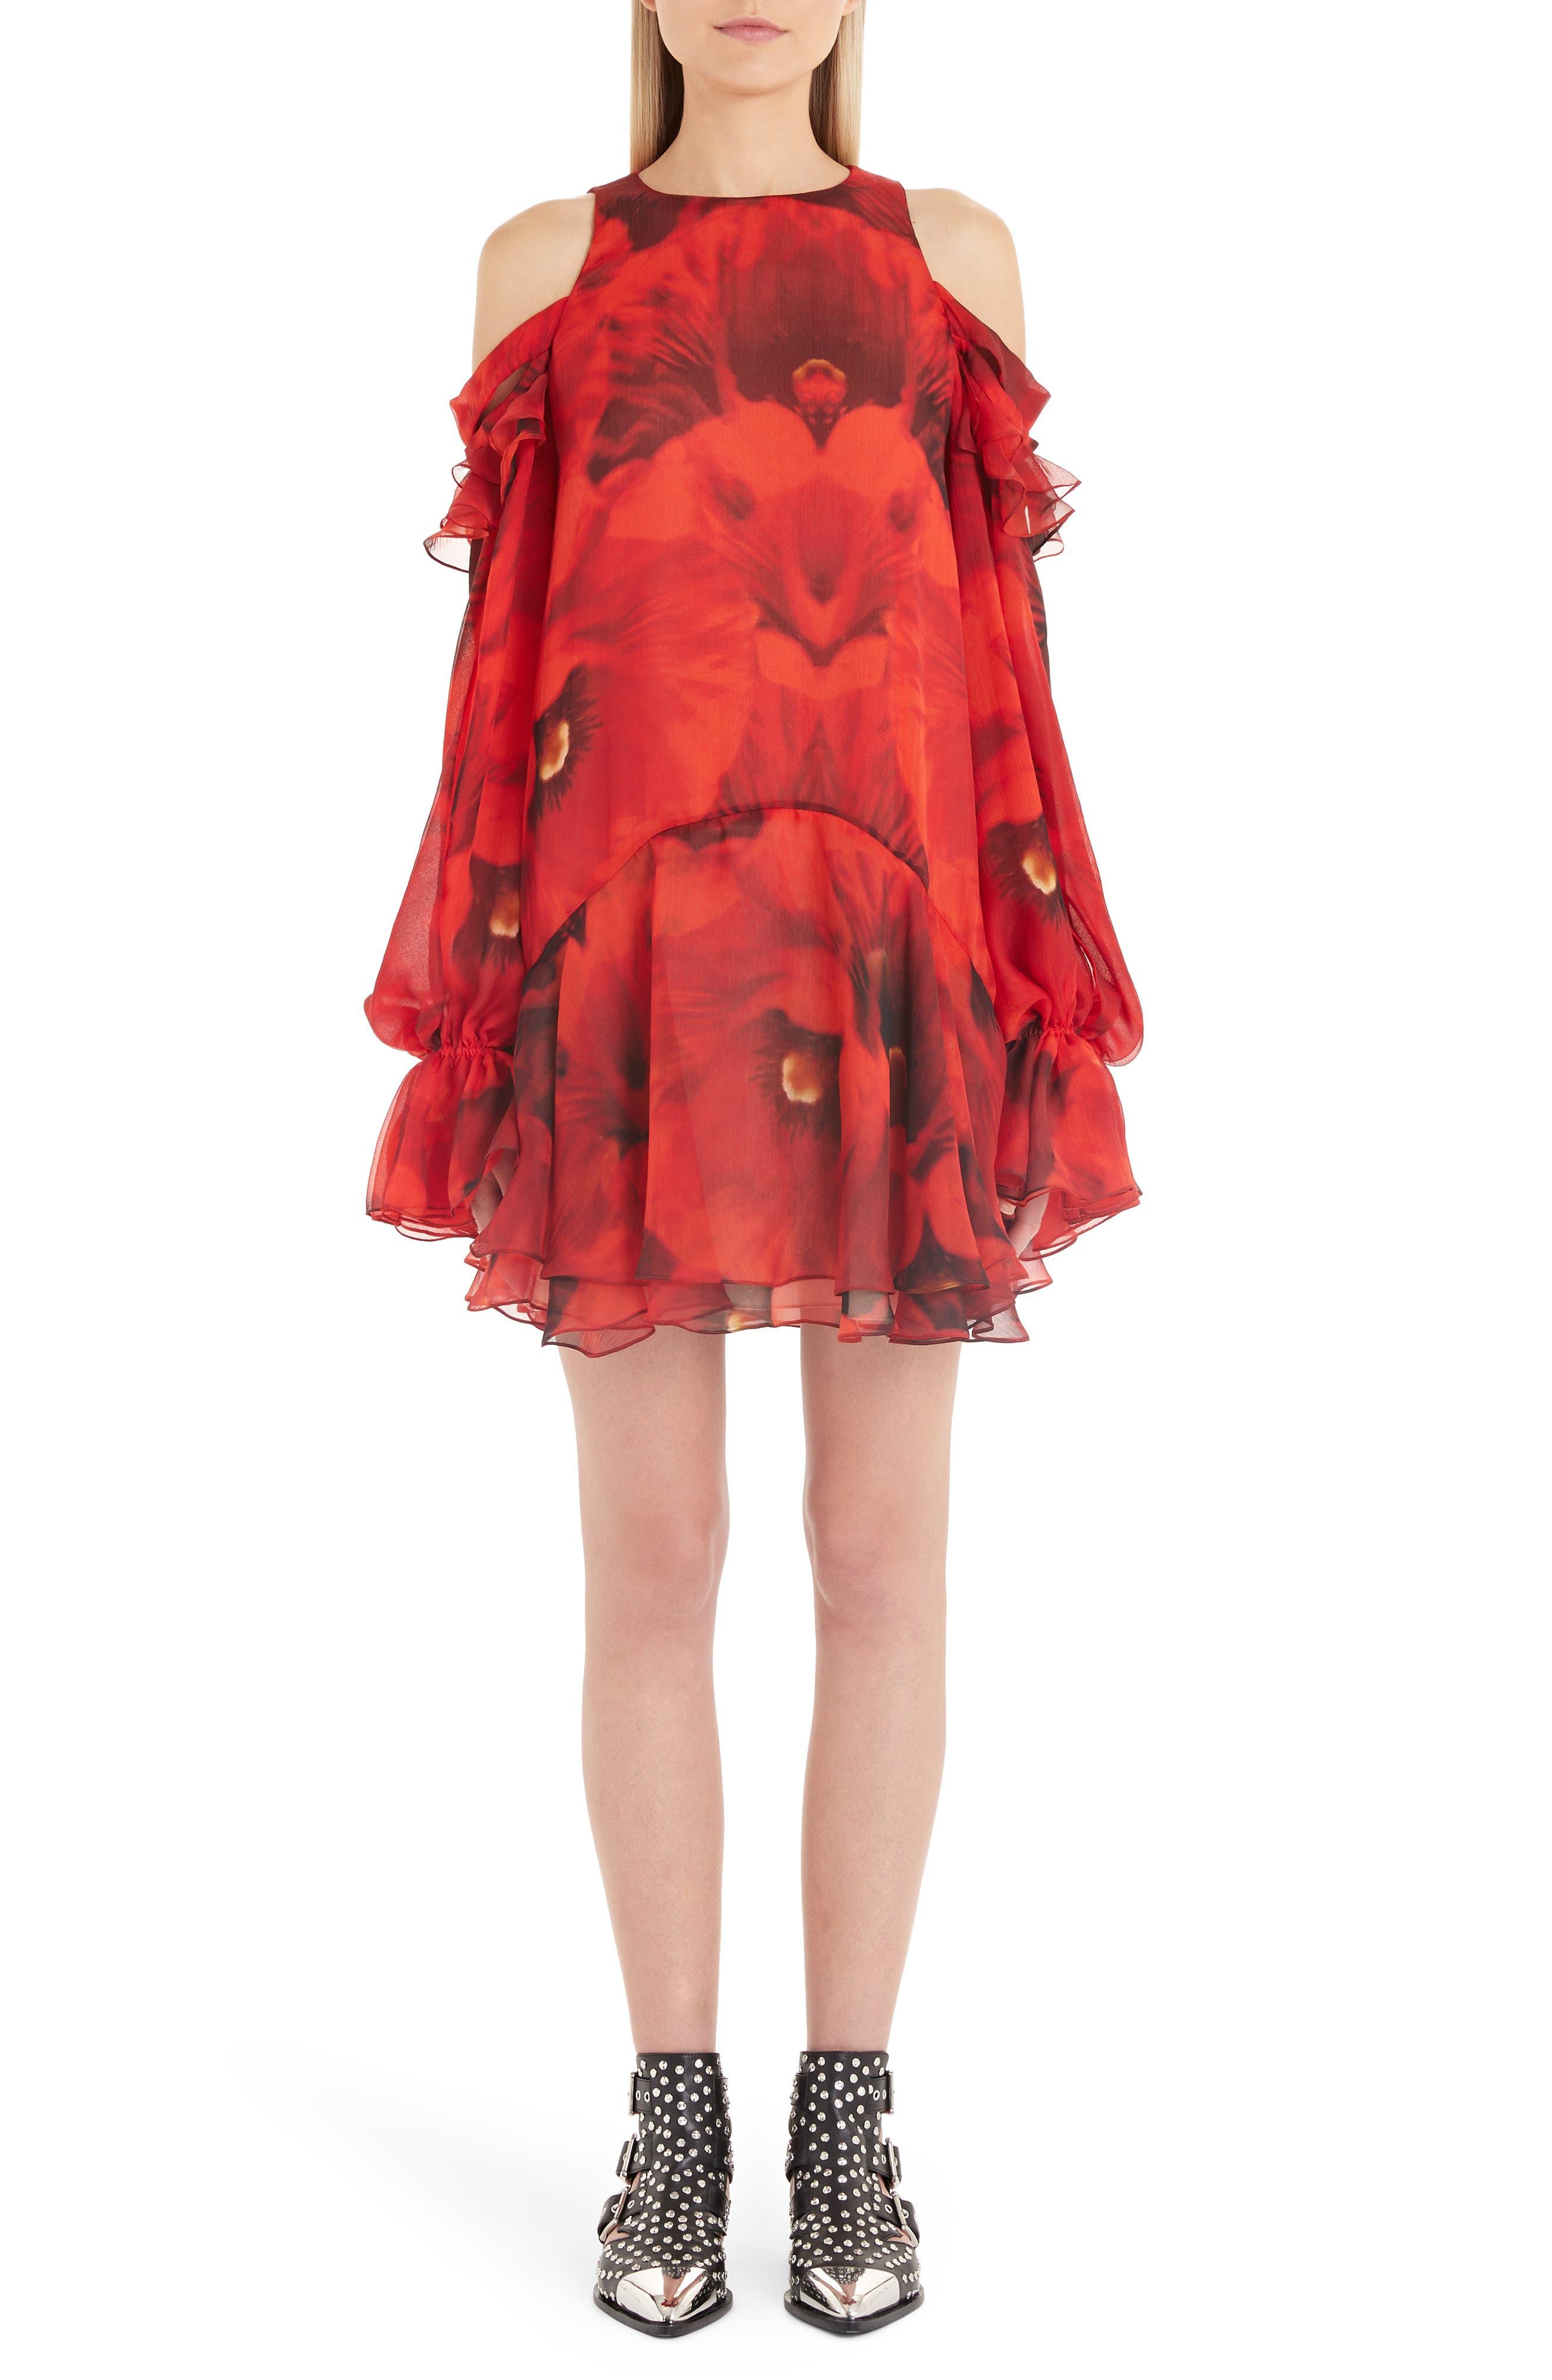 Alexander Mcqueen Poppy Print Cold Shoulder Silk Dress, US / 42 IT - Red